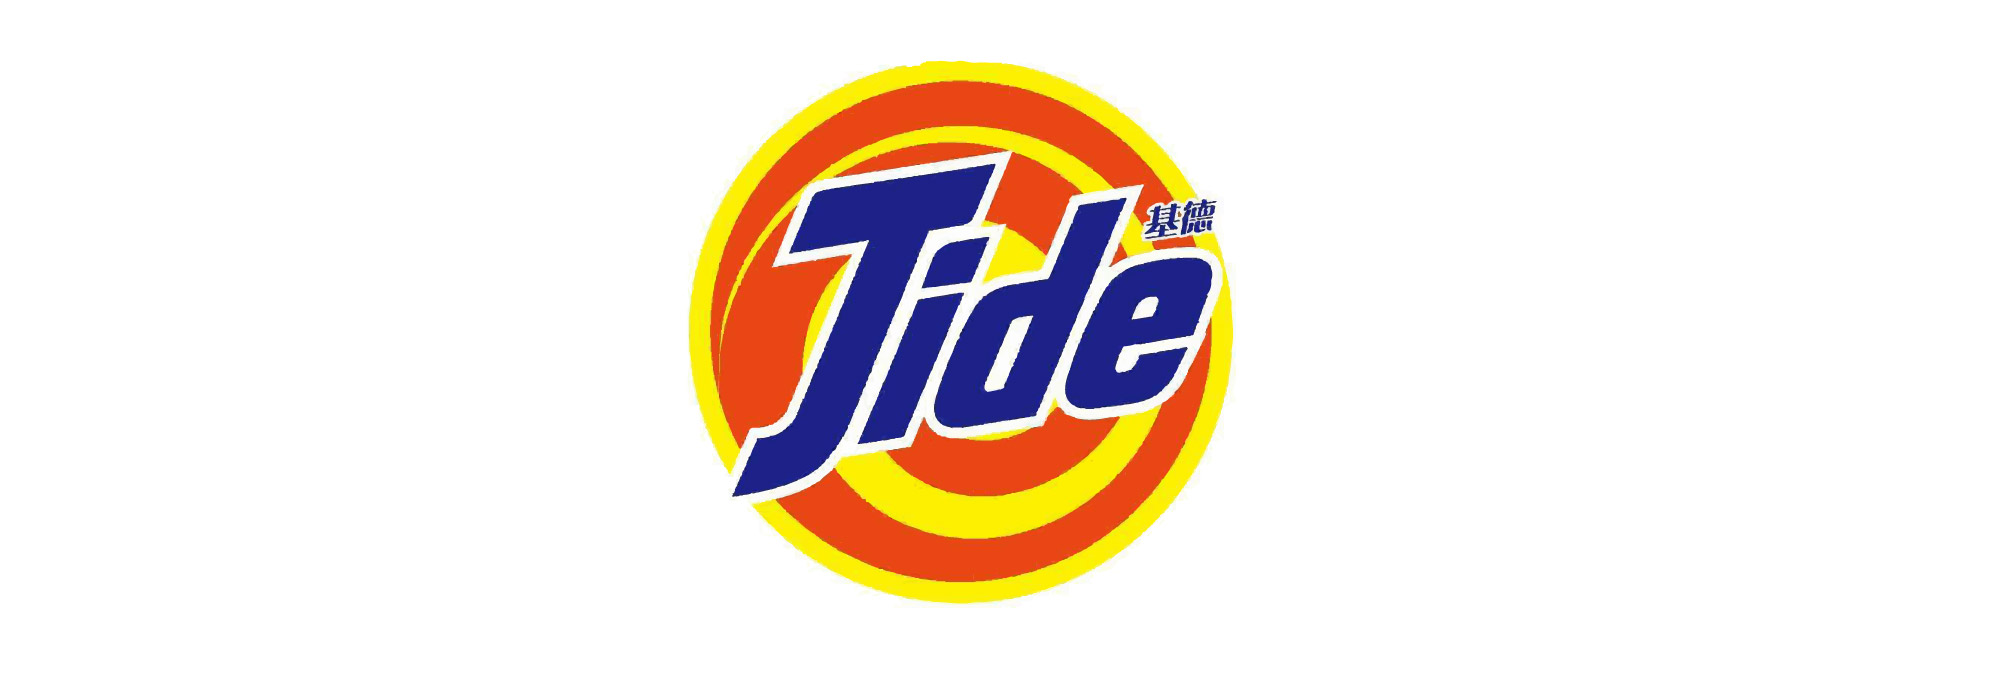 汰渍(TIDE)